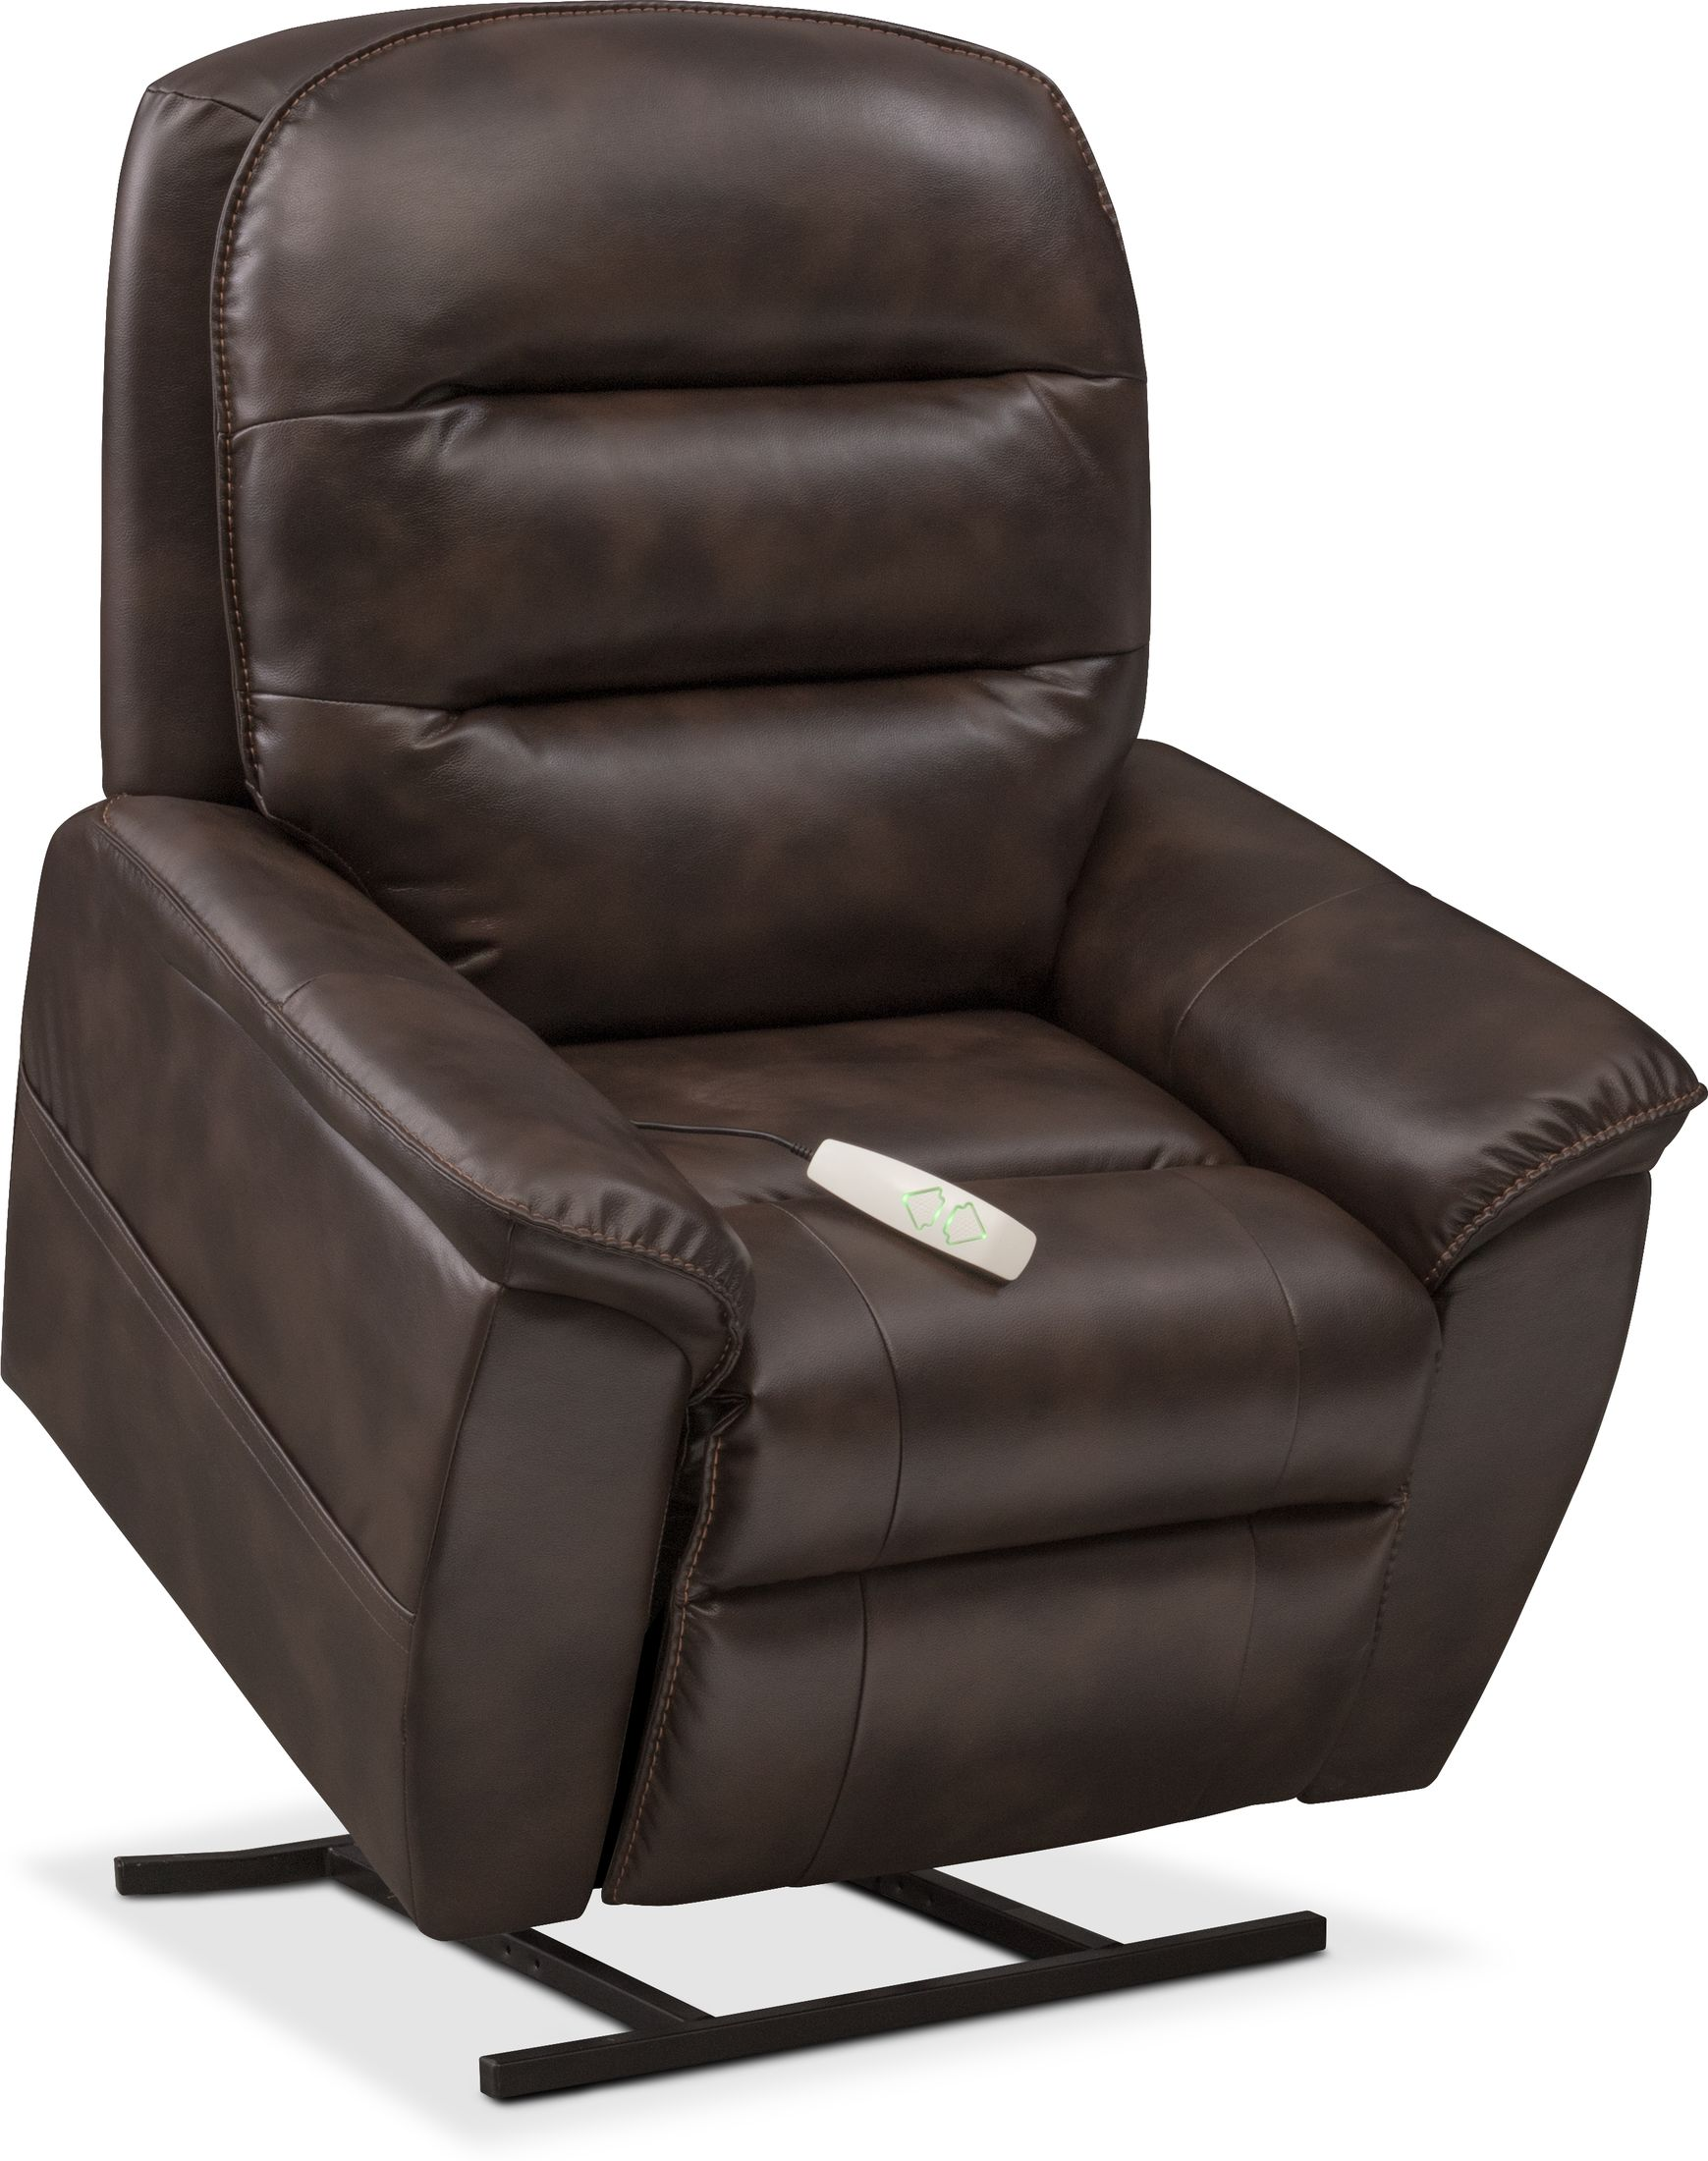 Living Room Furniture - Regis Power Lift Recliner